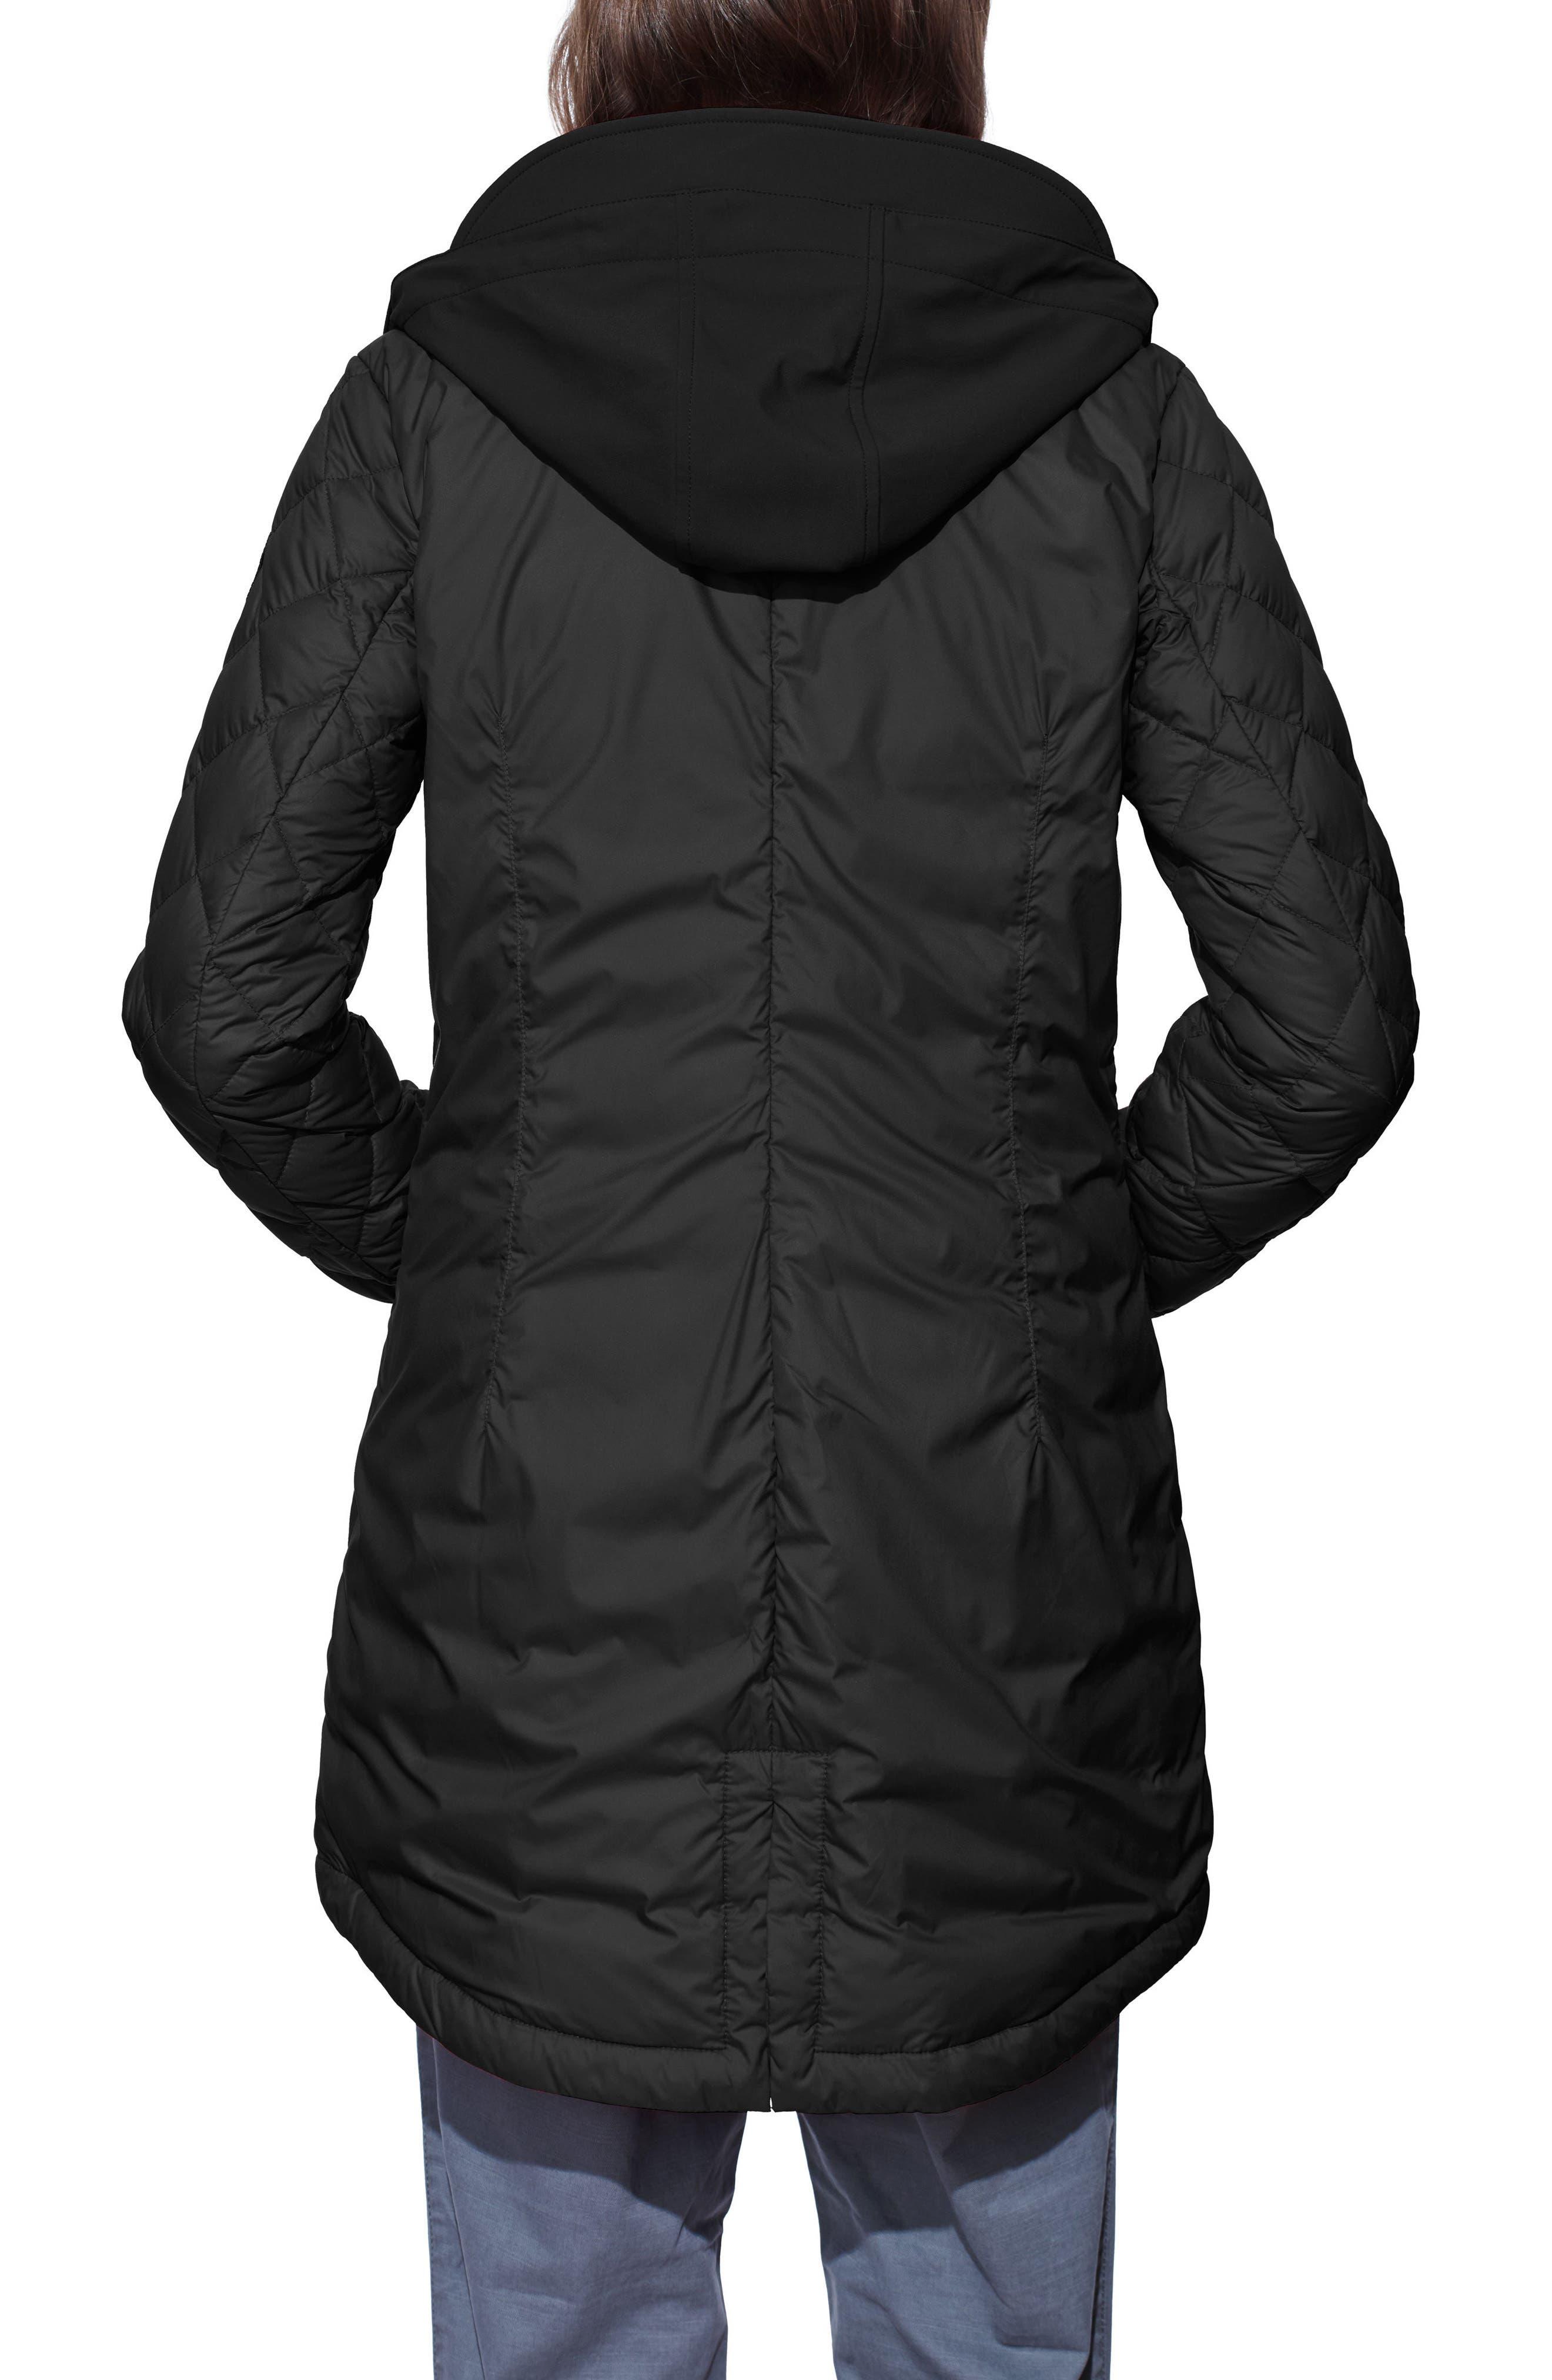 Stellarton Slim Fit Down Coat,                             Alternate thumbnail 2, color,                             Black/ Black